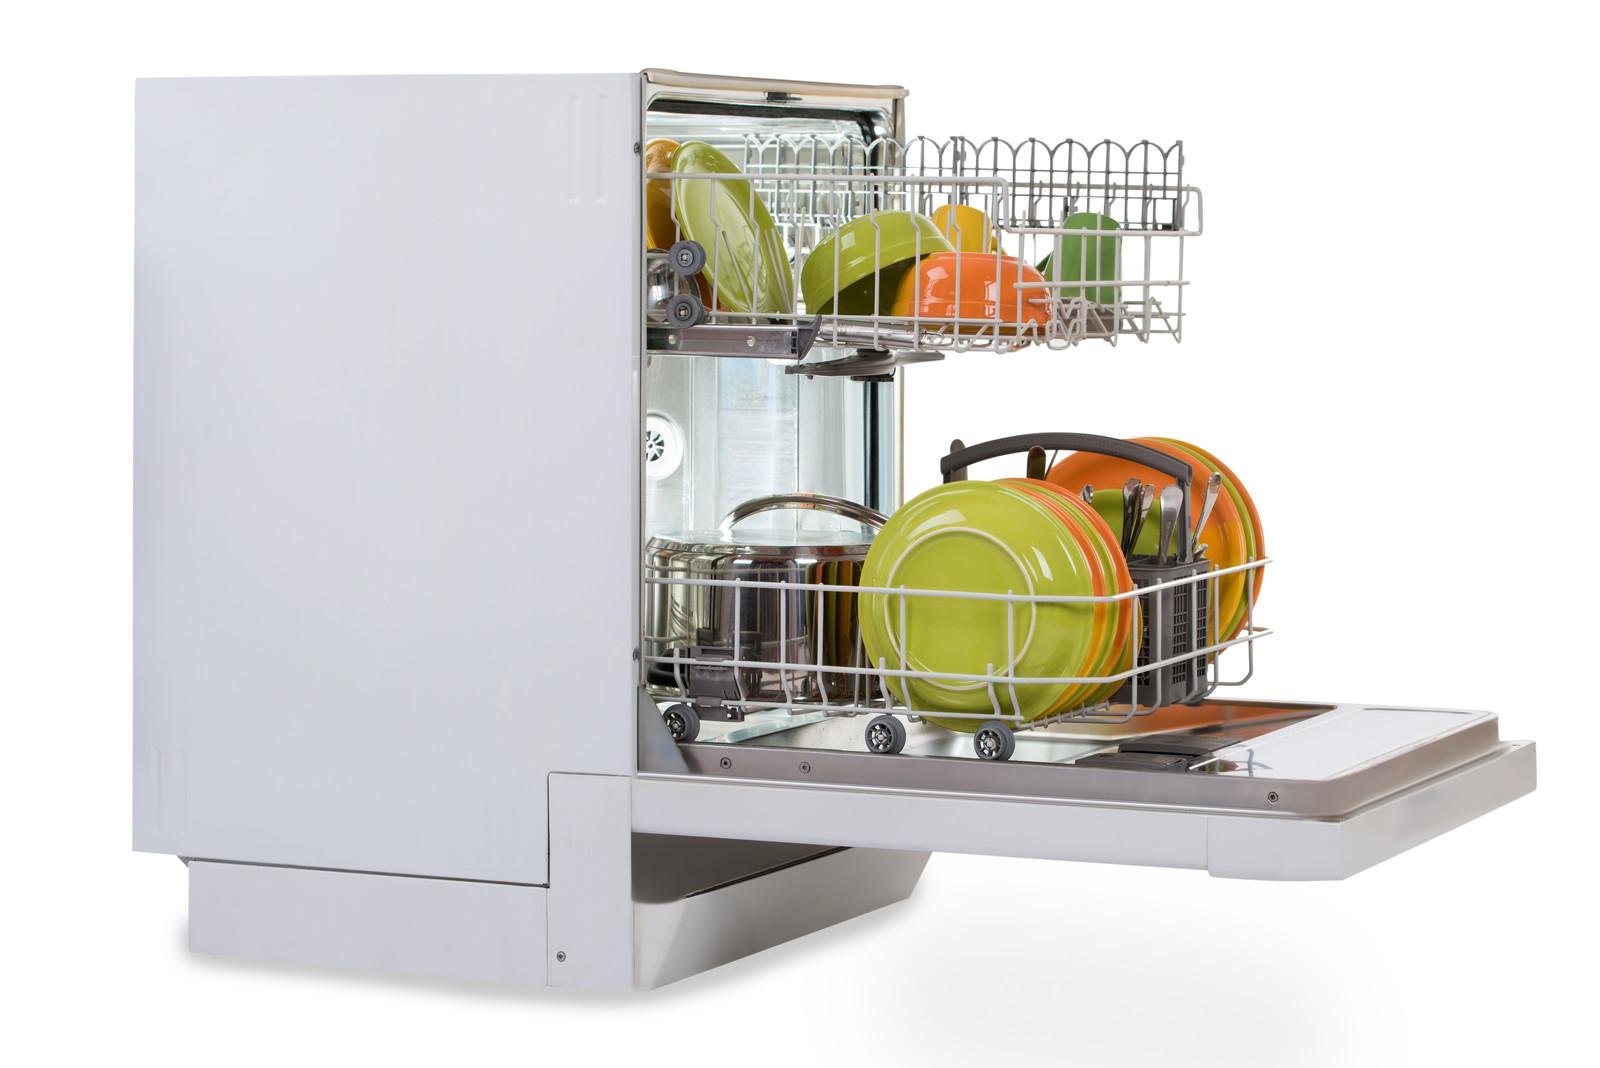 Siemens Kühlschrank Liegend Transportieren : Spülmaschine transportieren beim umzug